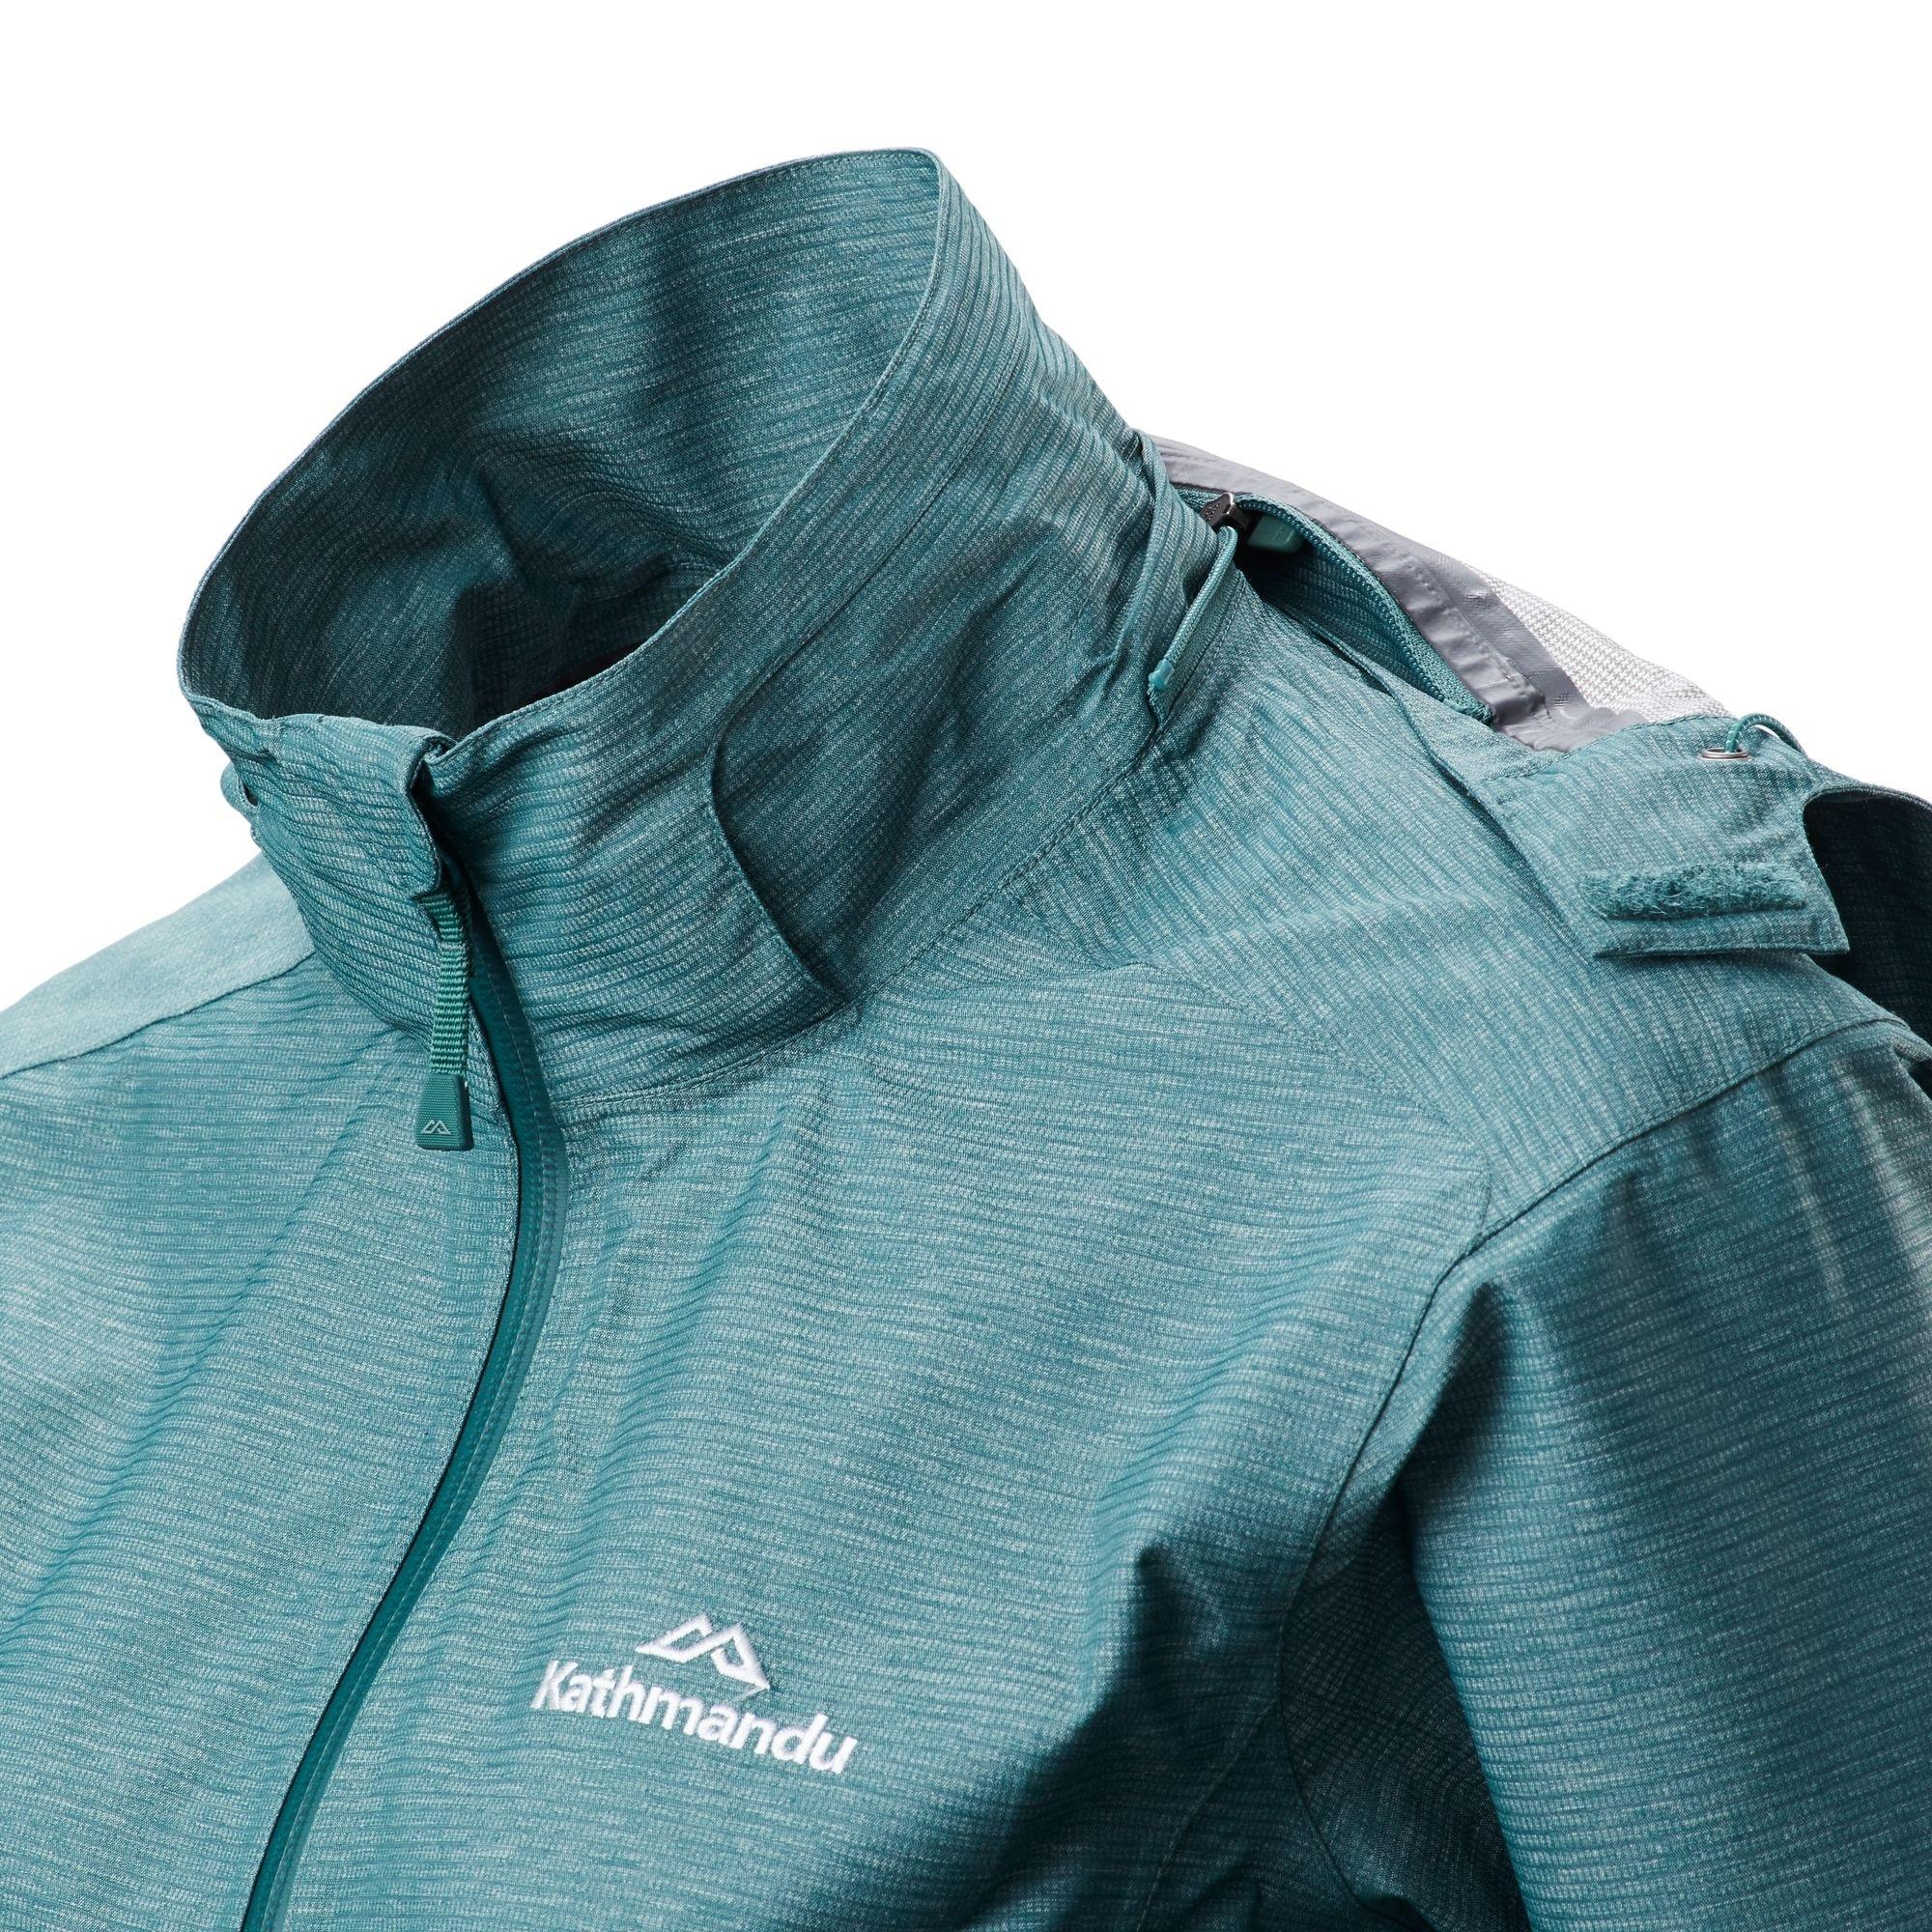 NEW-Kathmandu-Lawrence-Women-039-s-ngx-Windproof-Waterproof-Outdoor-Rain-Jacket-v2 thumbnail 16